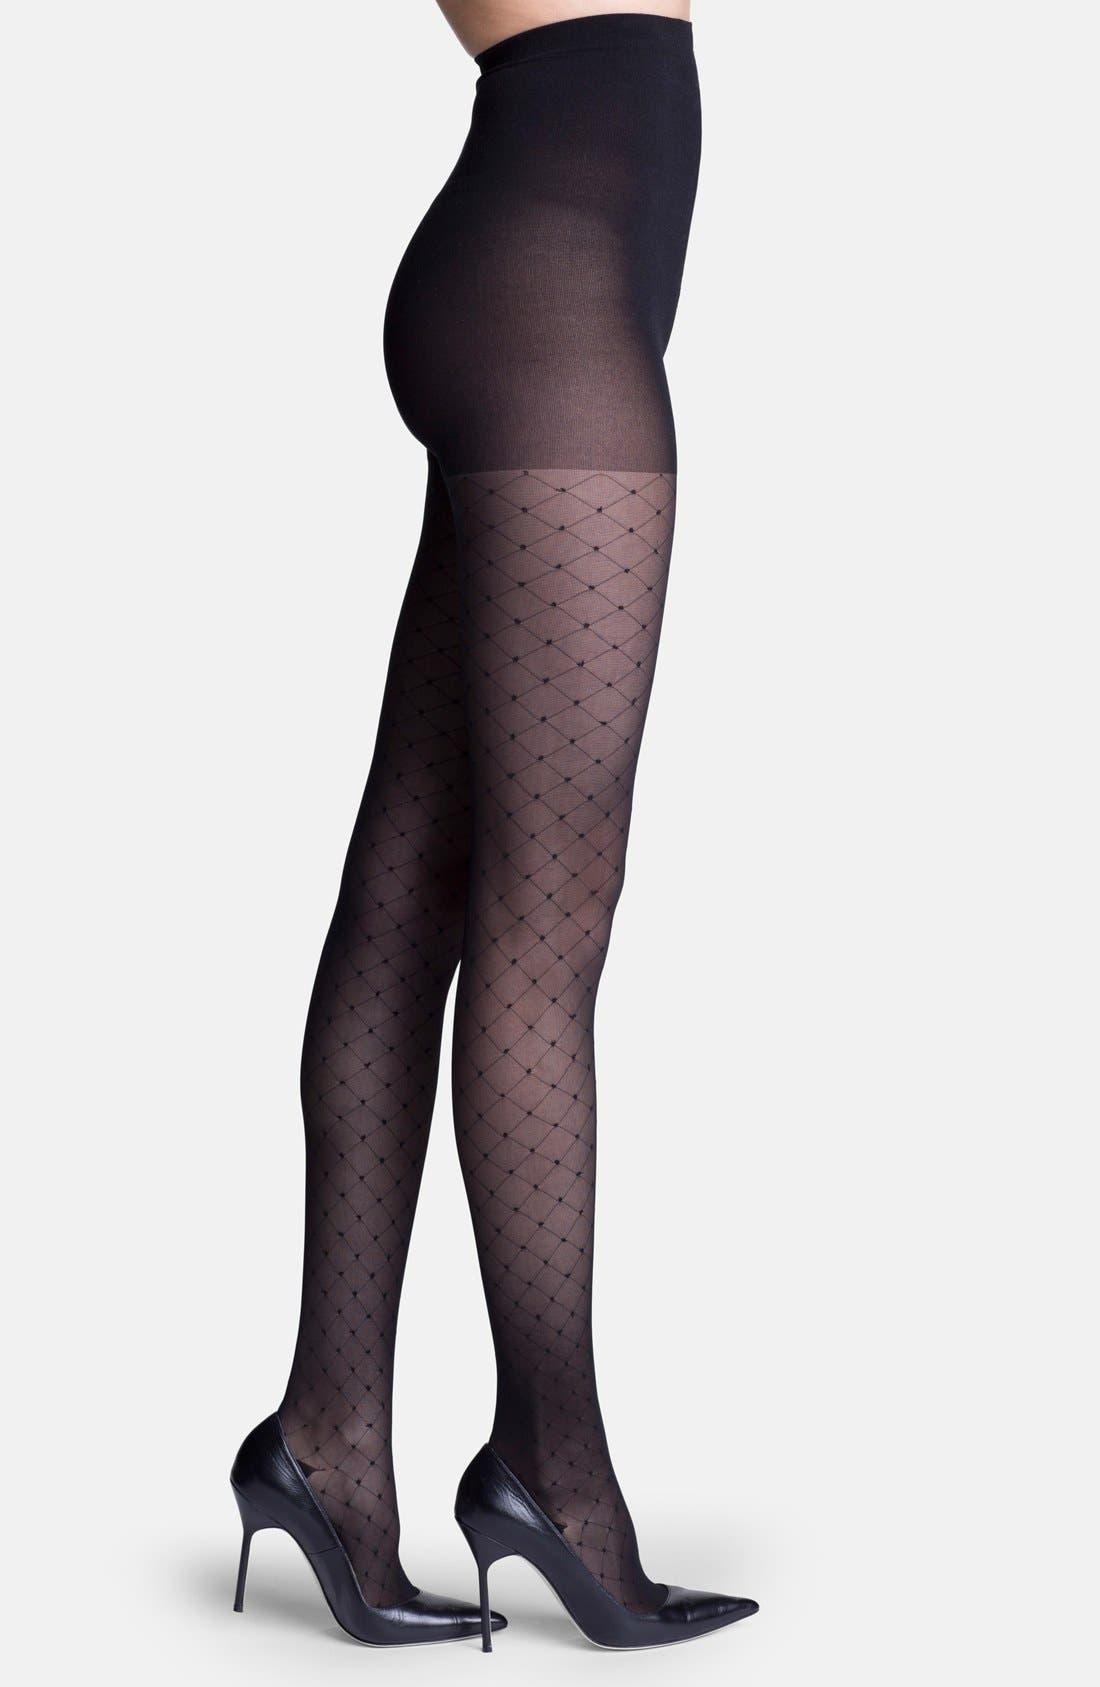 'Starlet' Diamond Pattern Compression Pantyhose,                         Main,                         color, Black